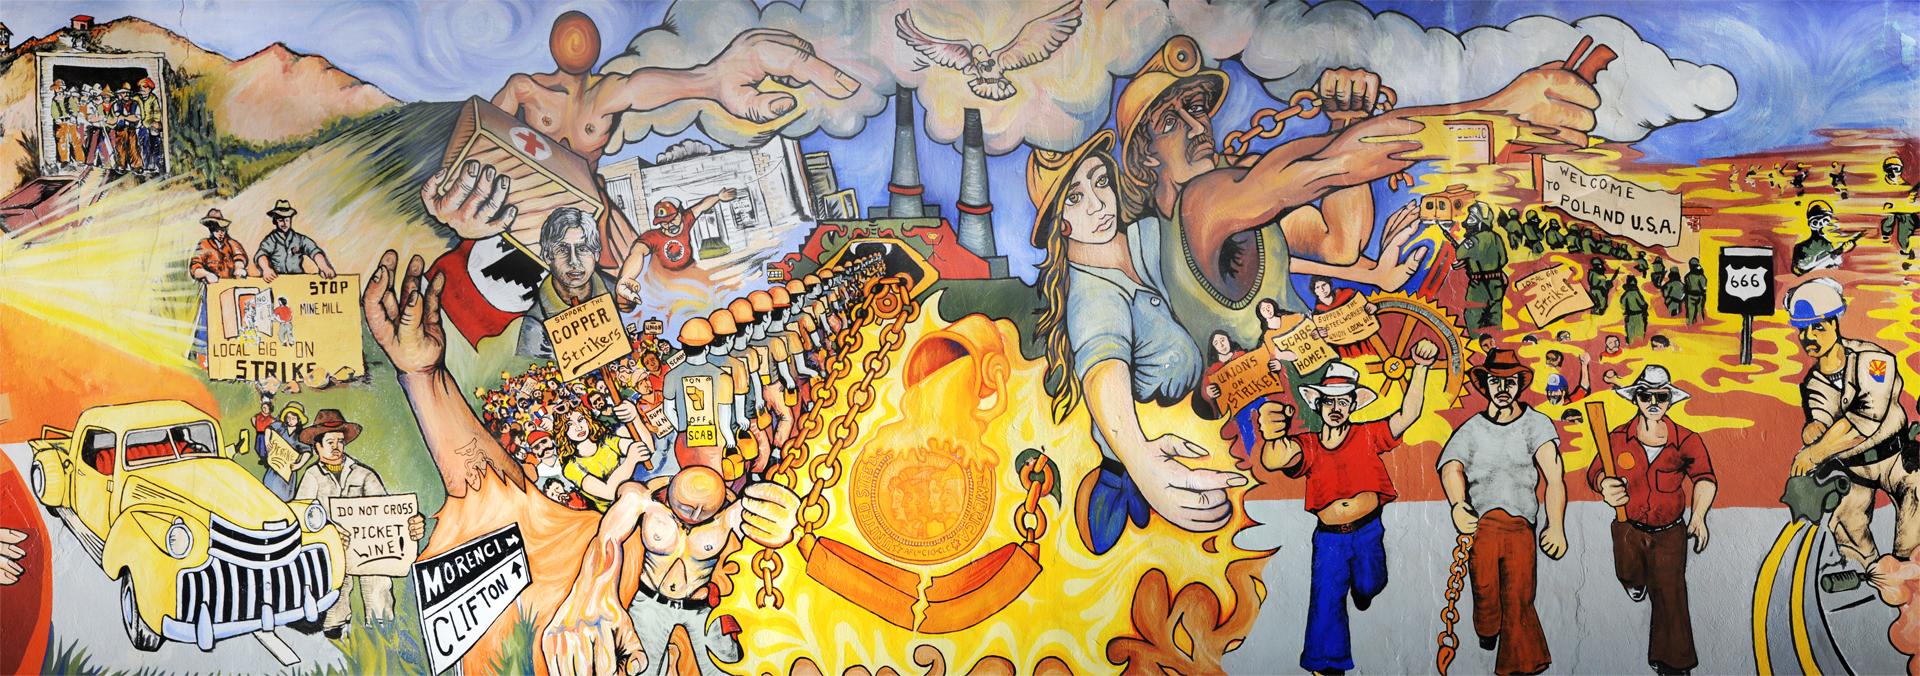 Clifton Union Hall Mural